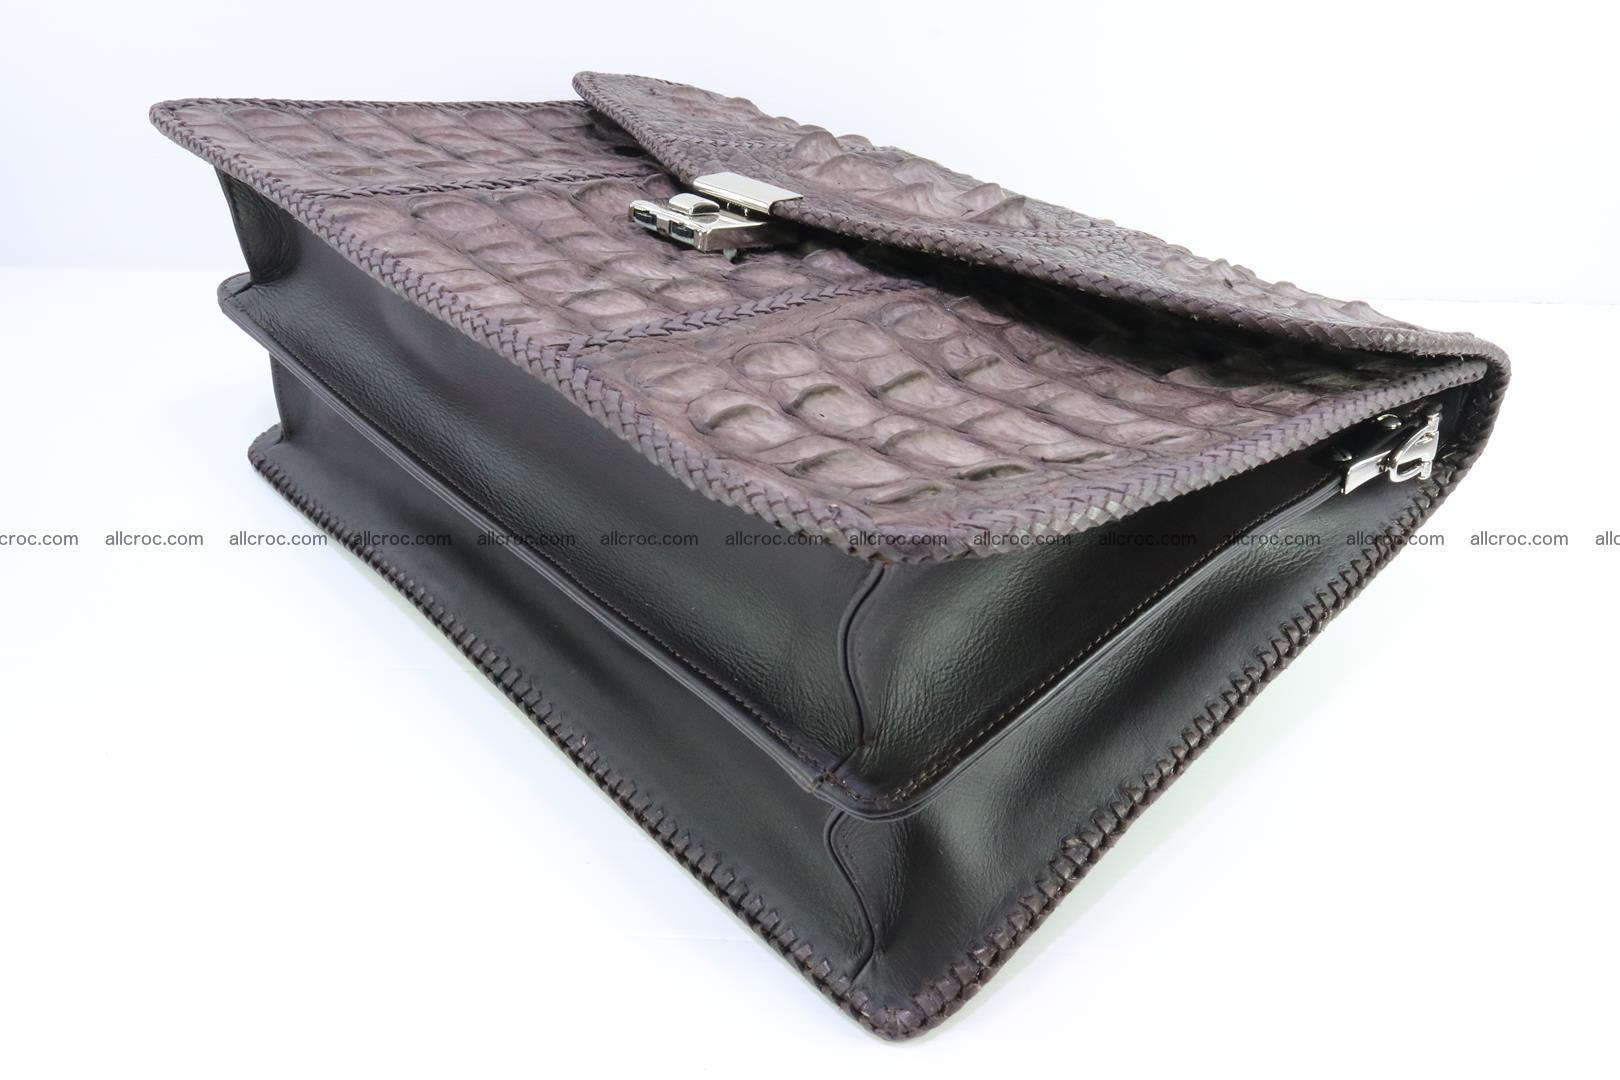 Hand braided crocodile skin briefcase 149 Foto 14